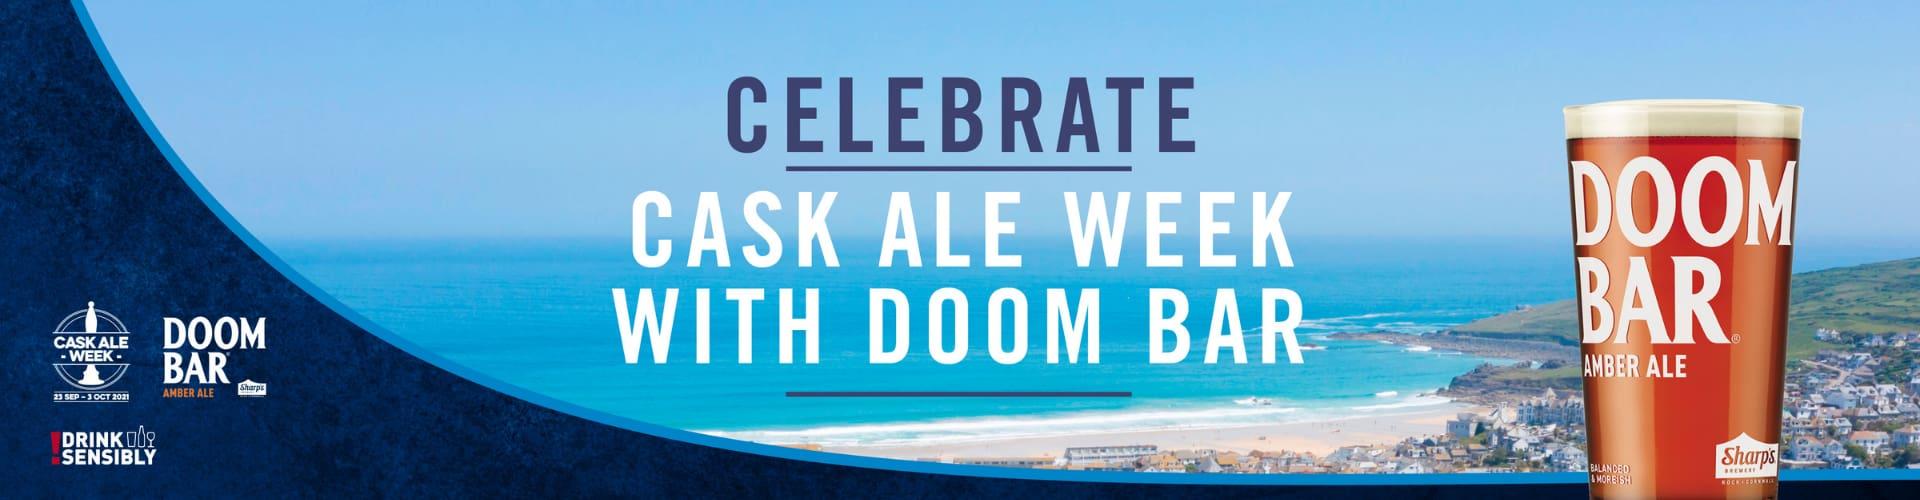 Celebrate Cask Ale Week with Doom Bar